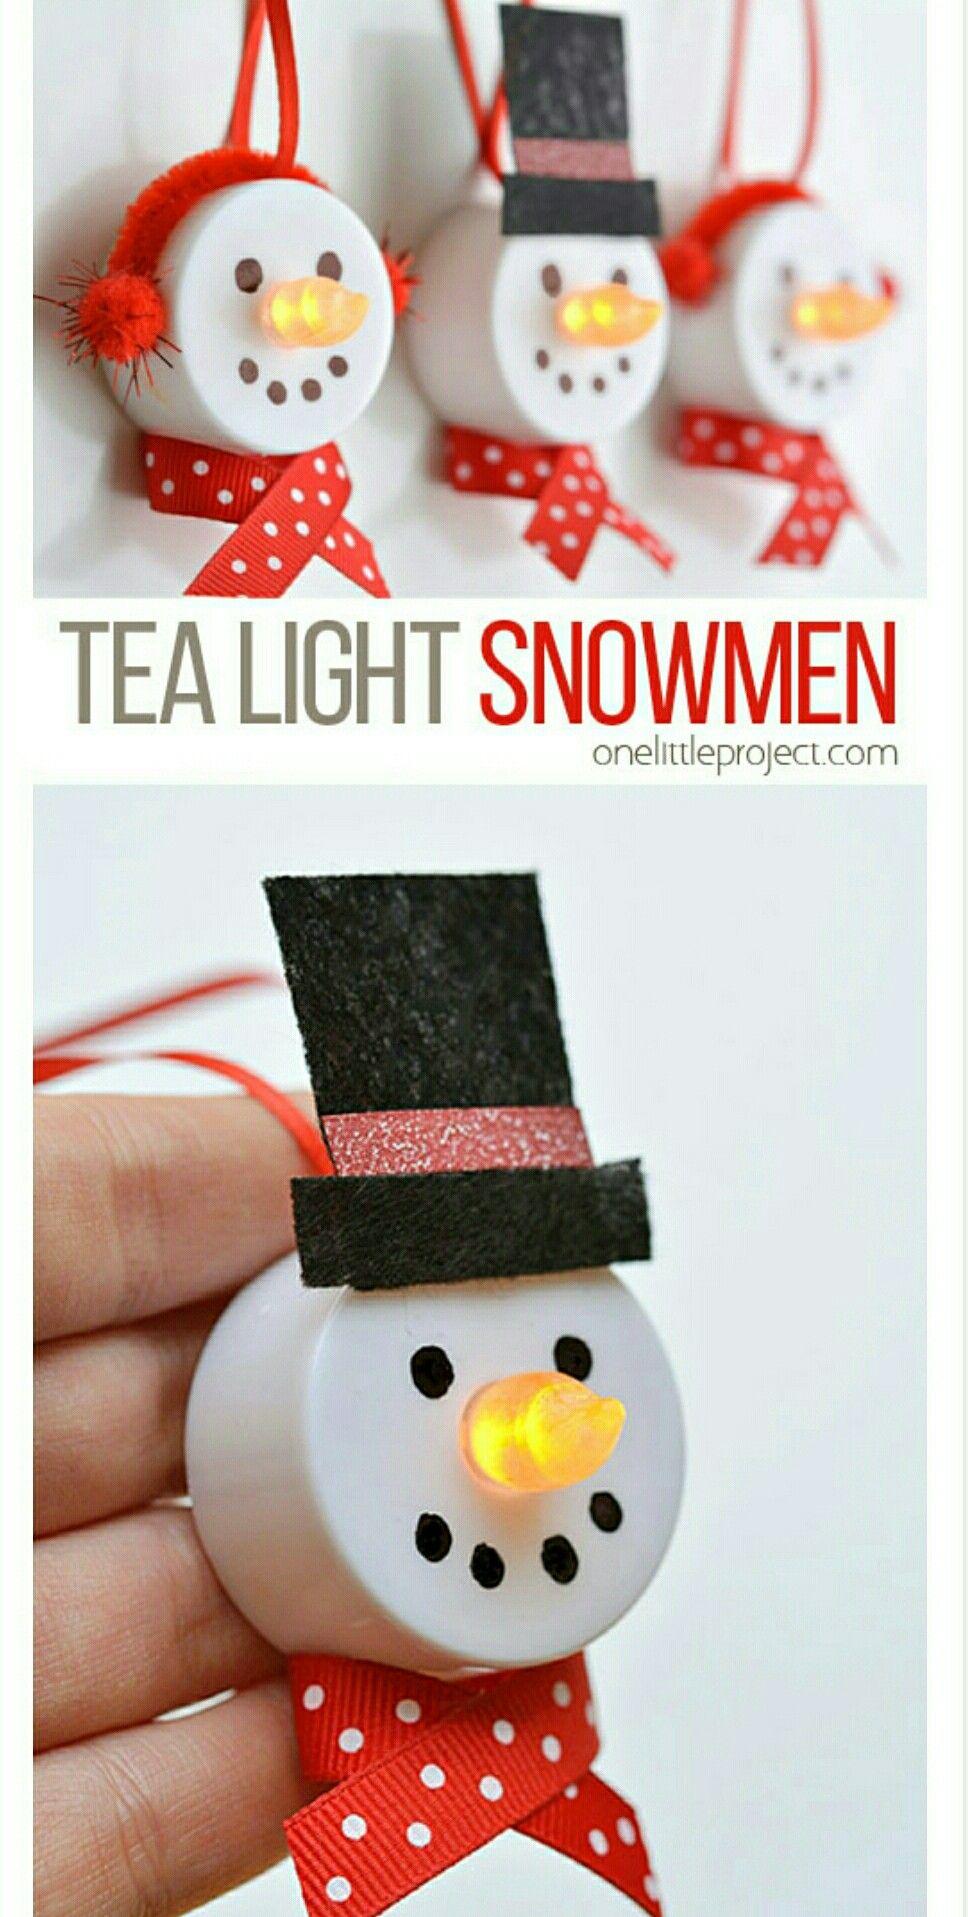 Tea Light Snowman Ornaments Diy Christmas Ornaments For Toddlers Tea Light Snowman Diy Christmas Gifts For Kids